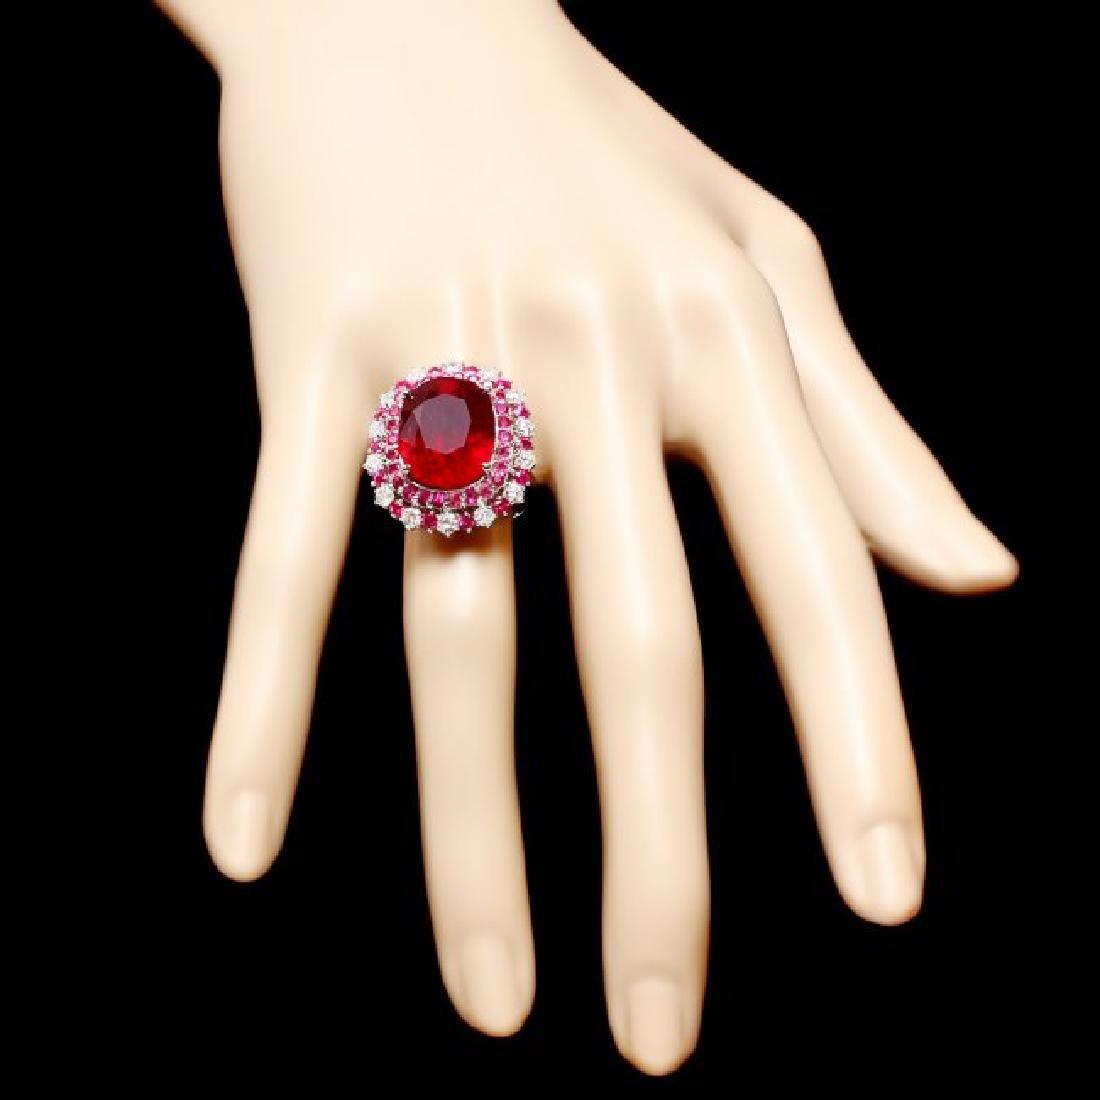 14k White Gold 17.5ct Ruby 0.88ct Diamond Ring - 4